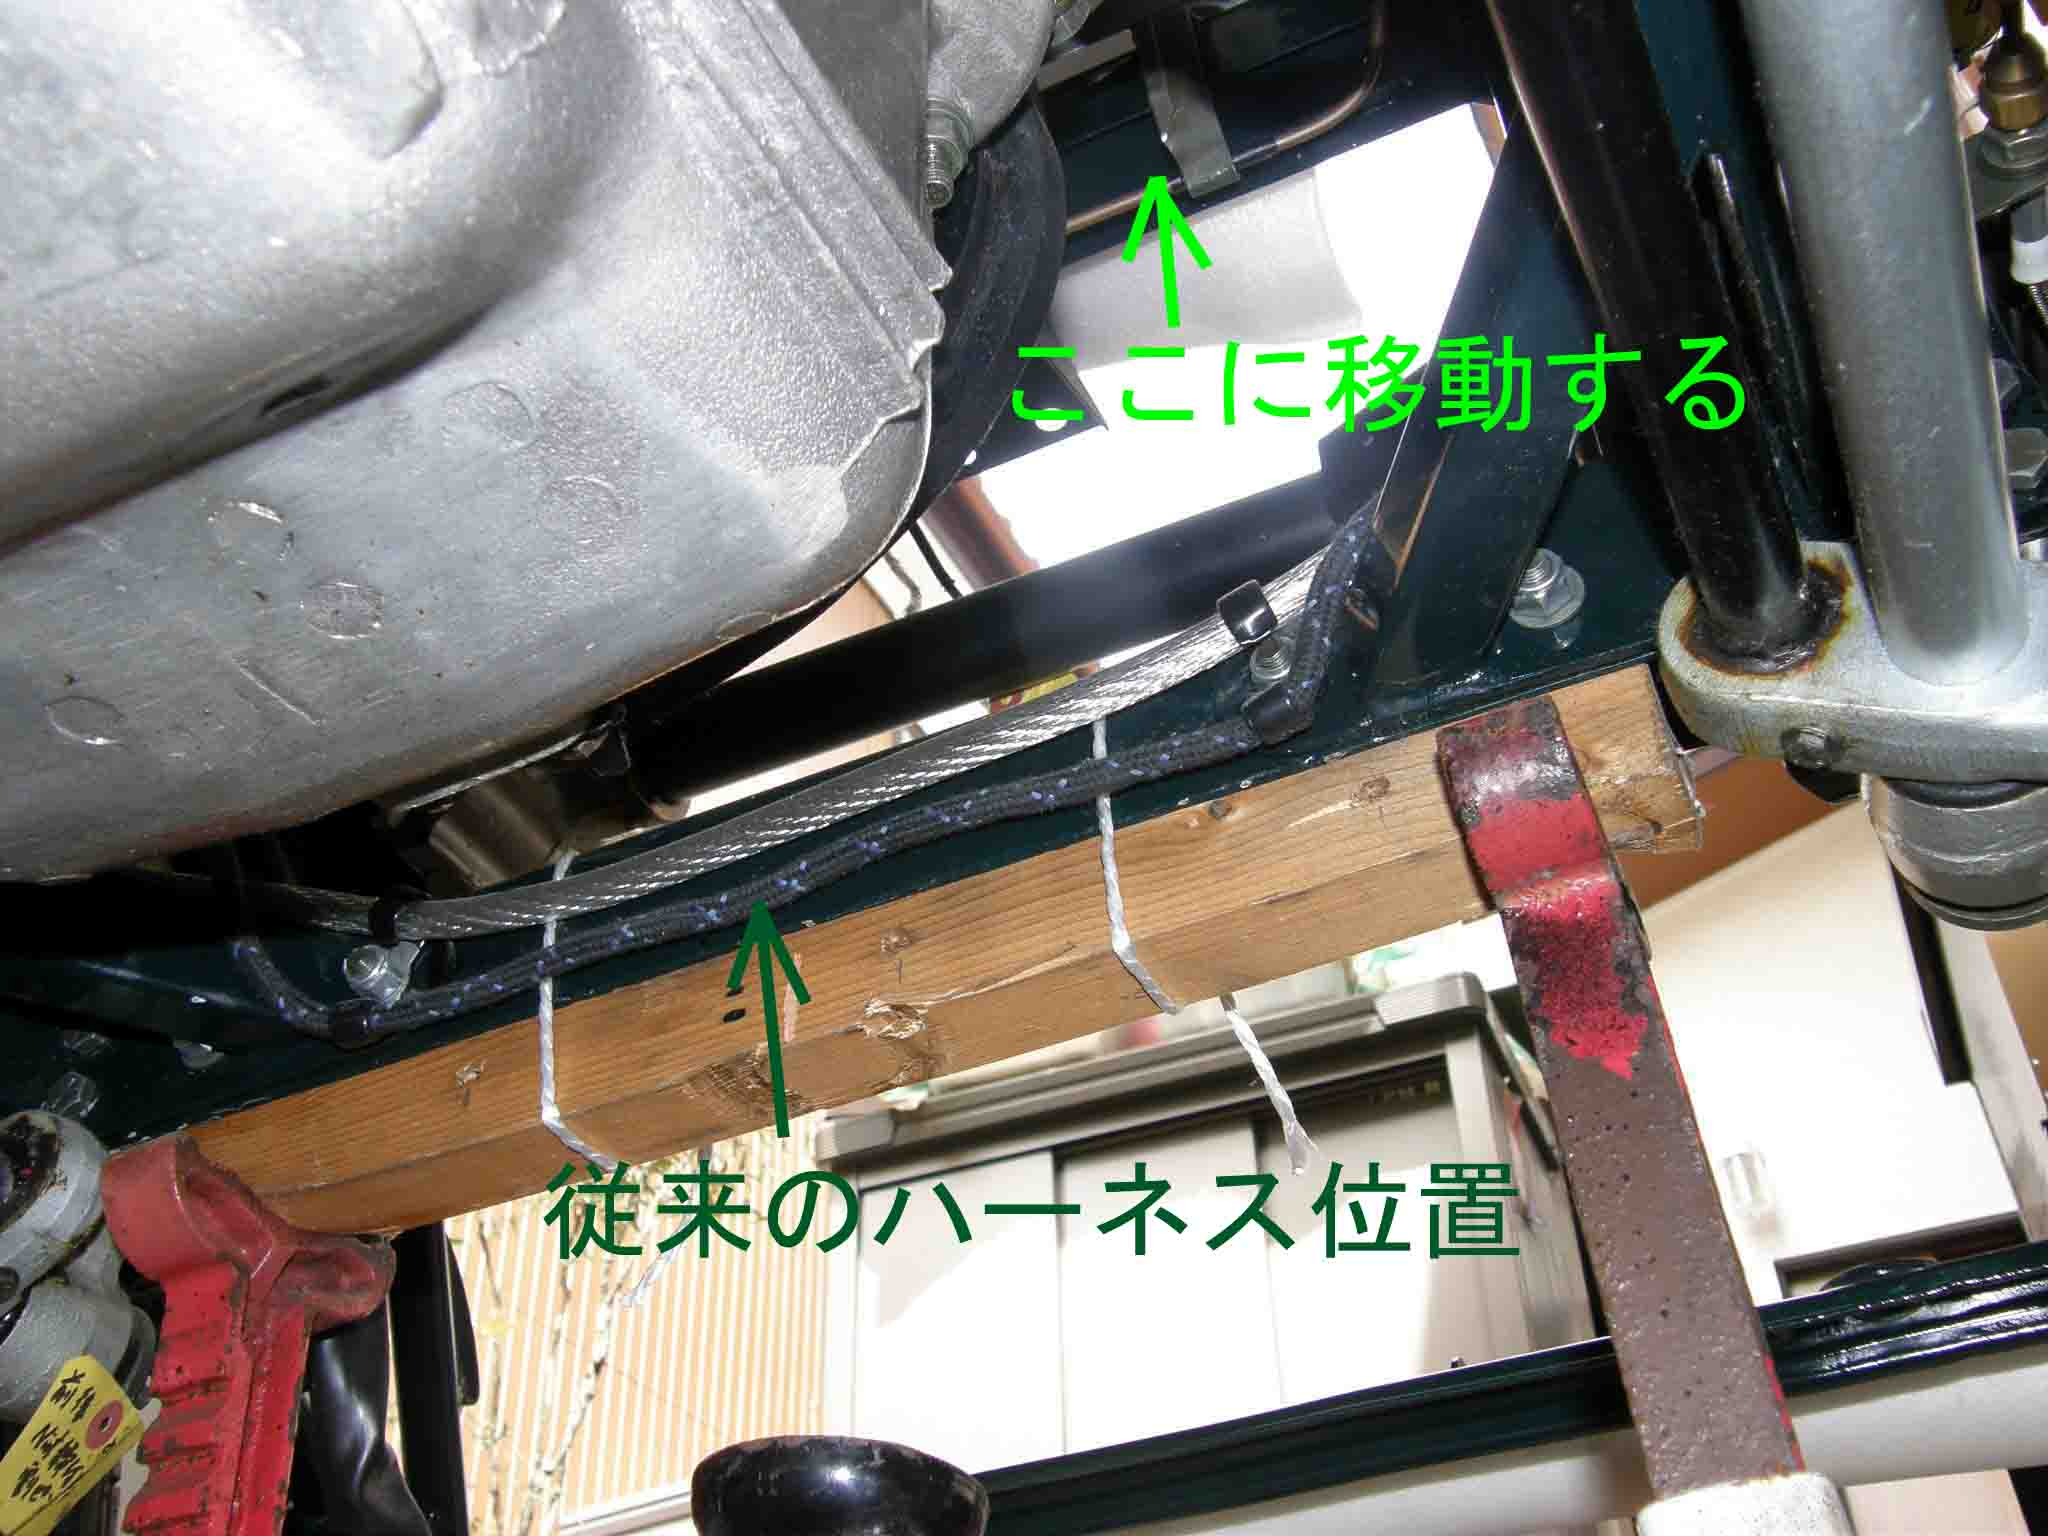 blogP5090411.jpg